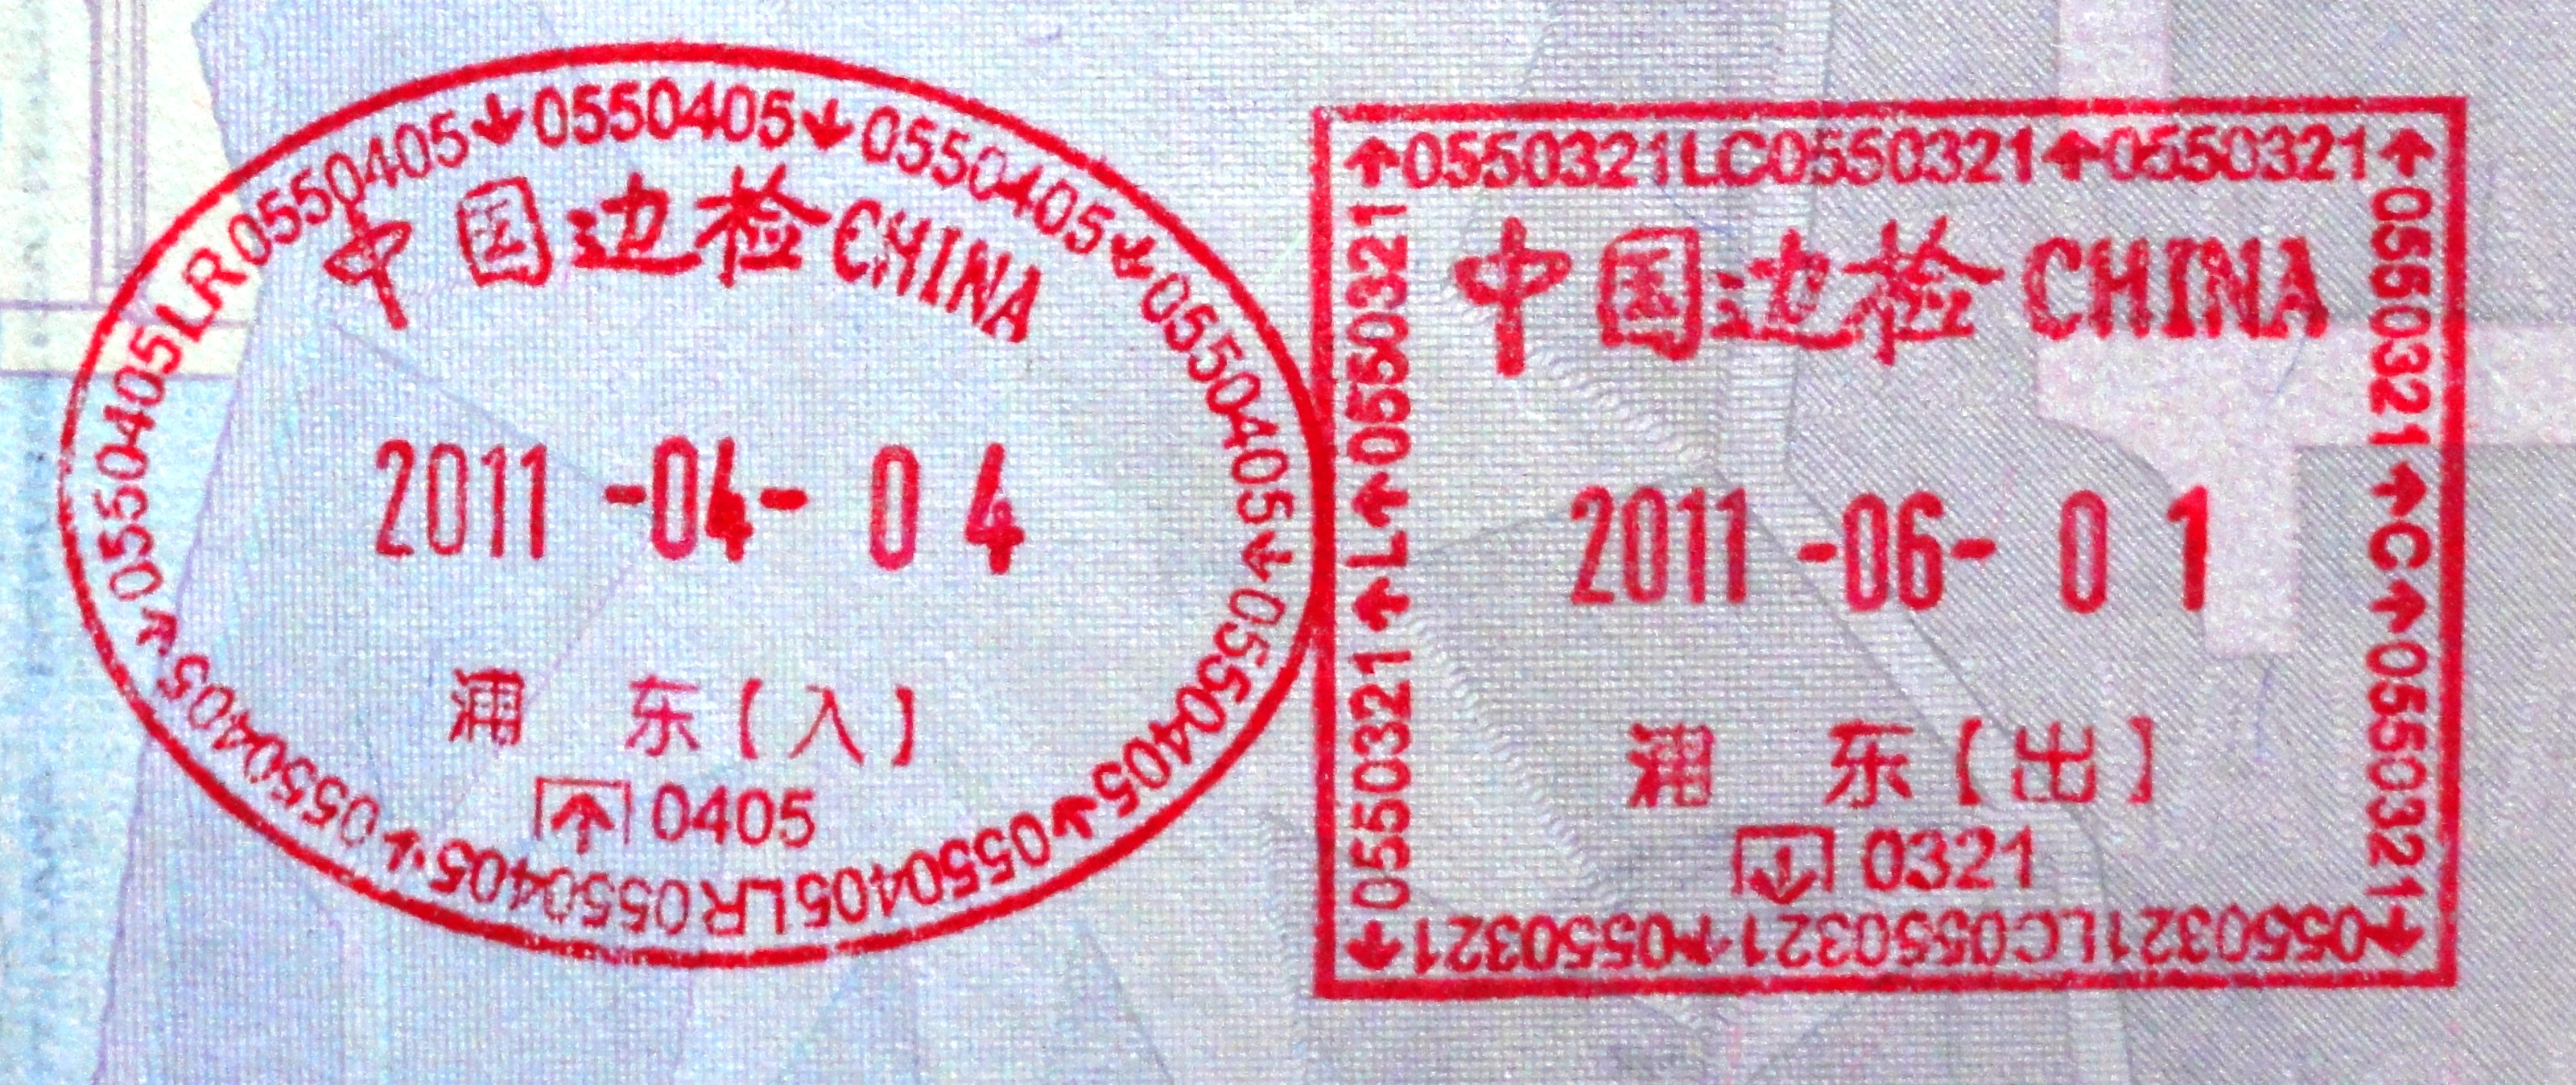 K Visa Travel Restrictions